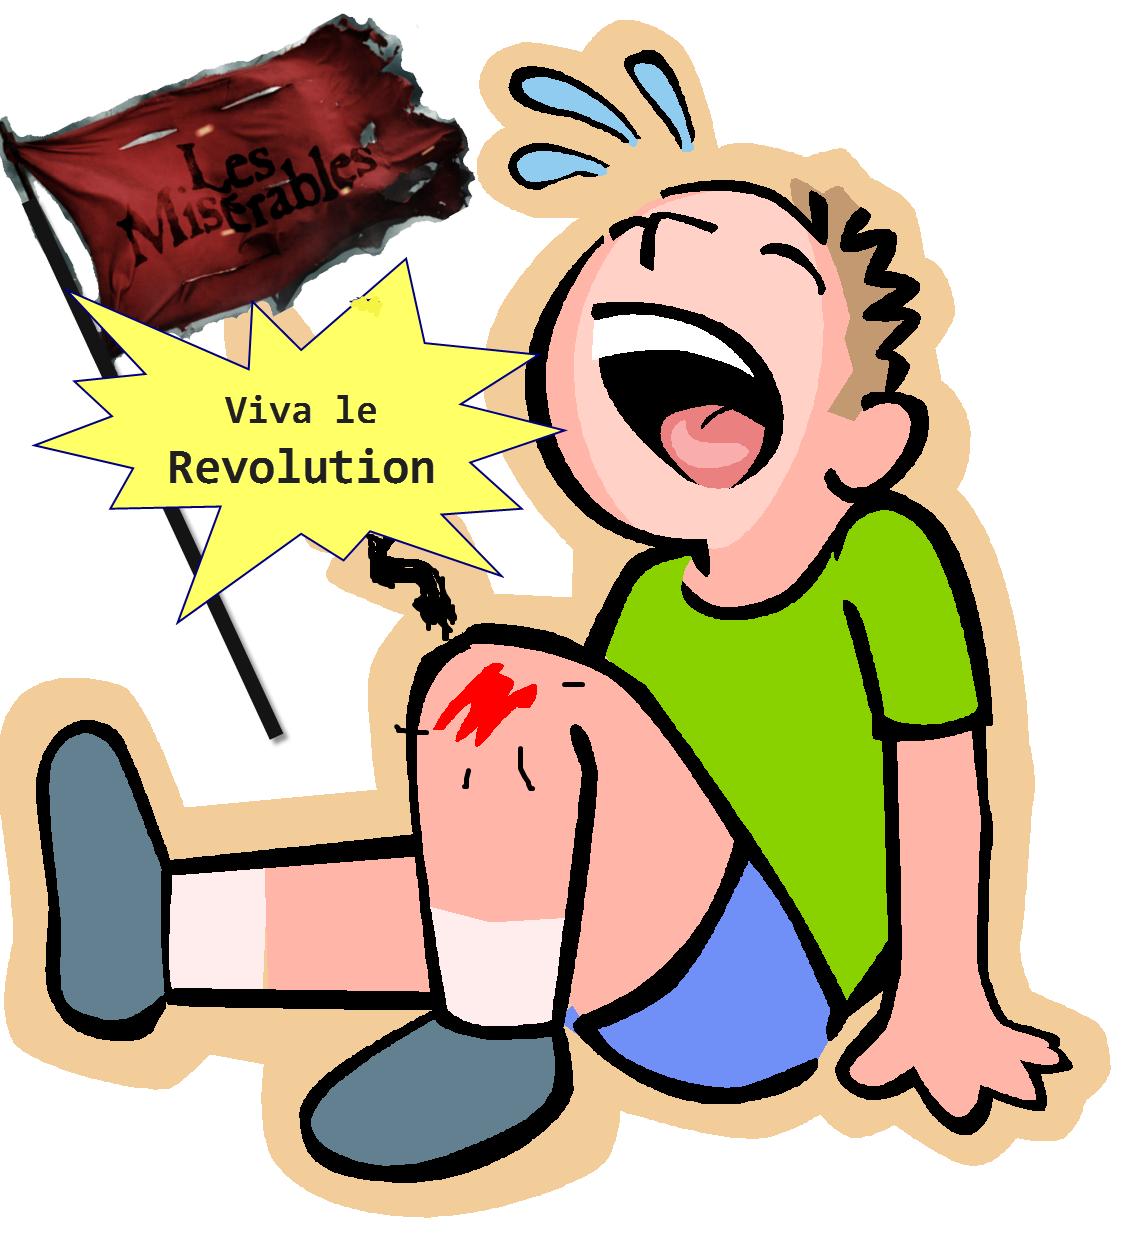 Le pain clipart jpg freeuse stock Knee pain clipart - ClipartFest jpg freeuse stock